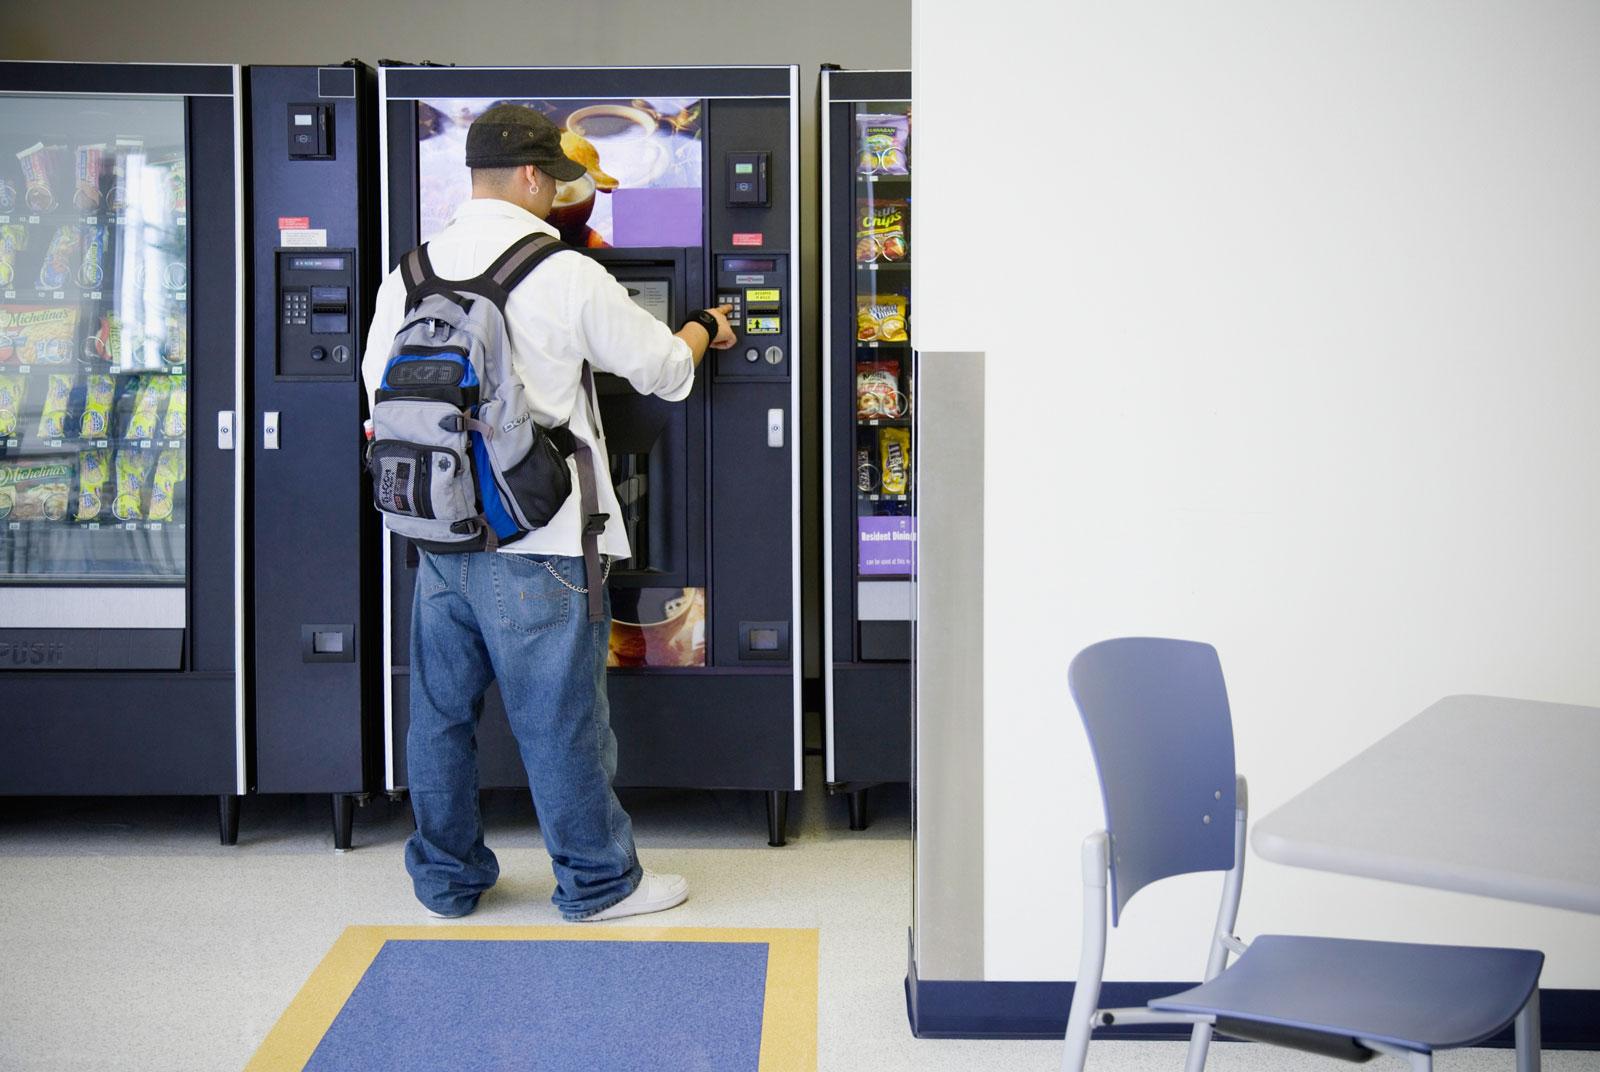 When vending machines attack (a university)